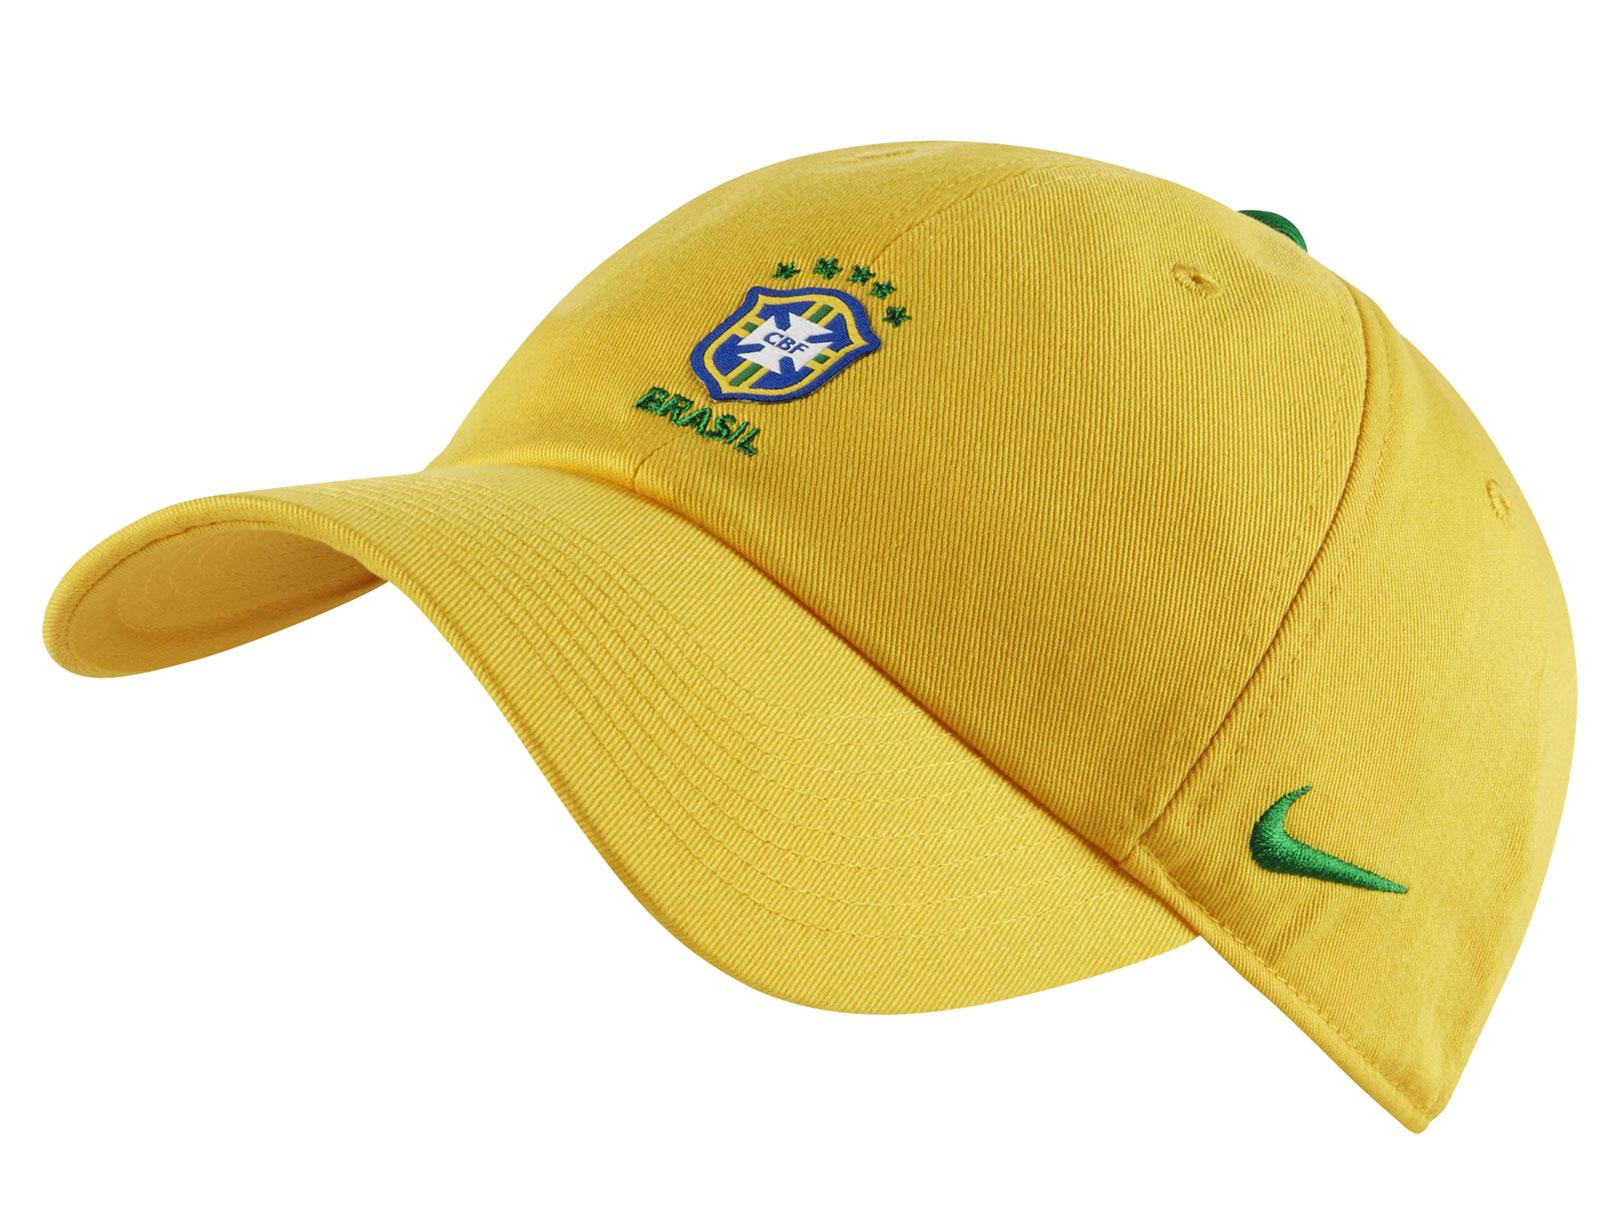 Liverpool: Gorra NIKE de Brasil y Portugal